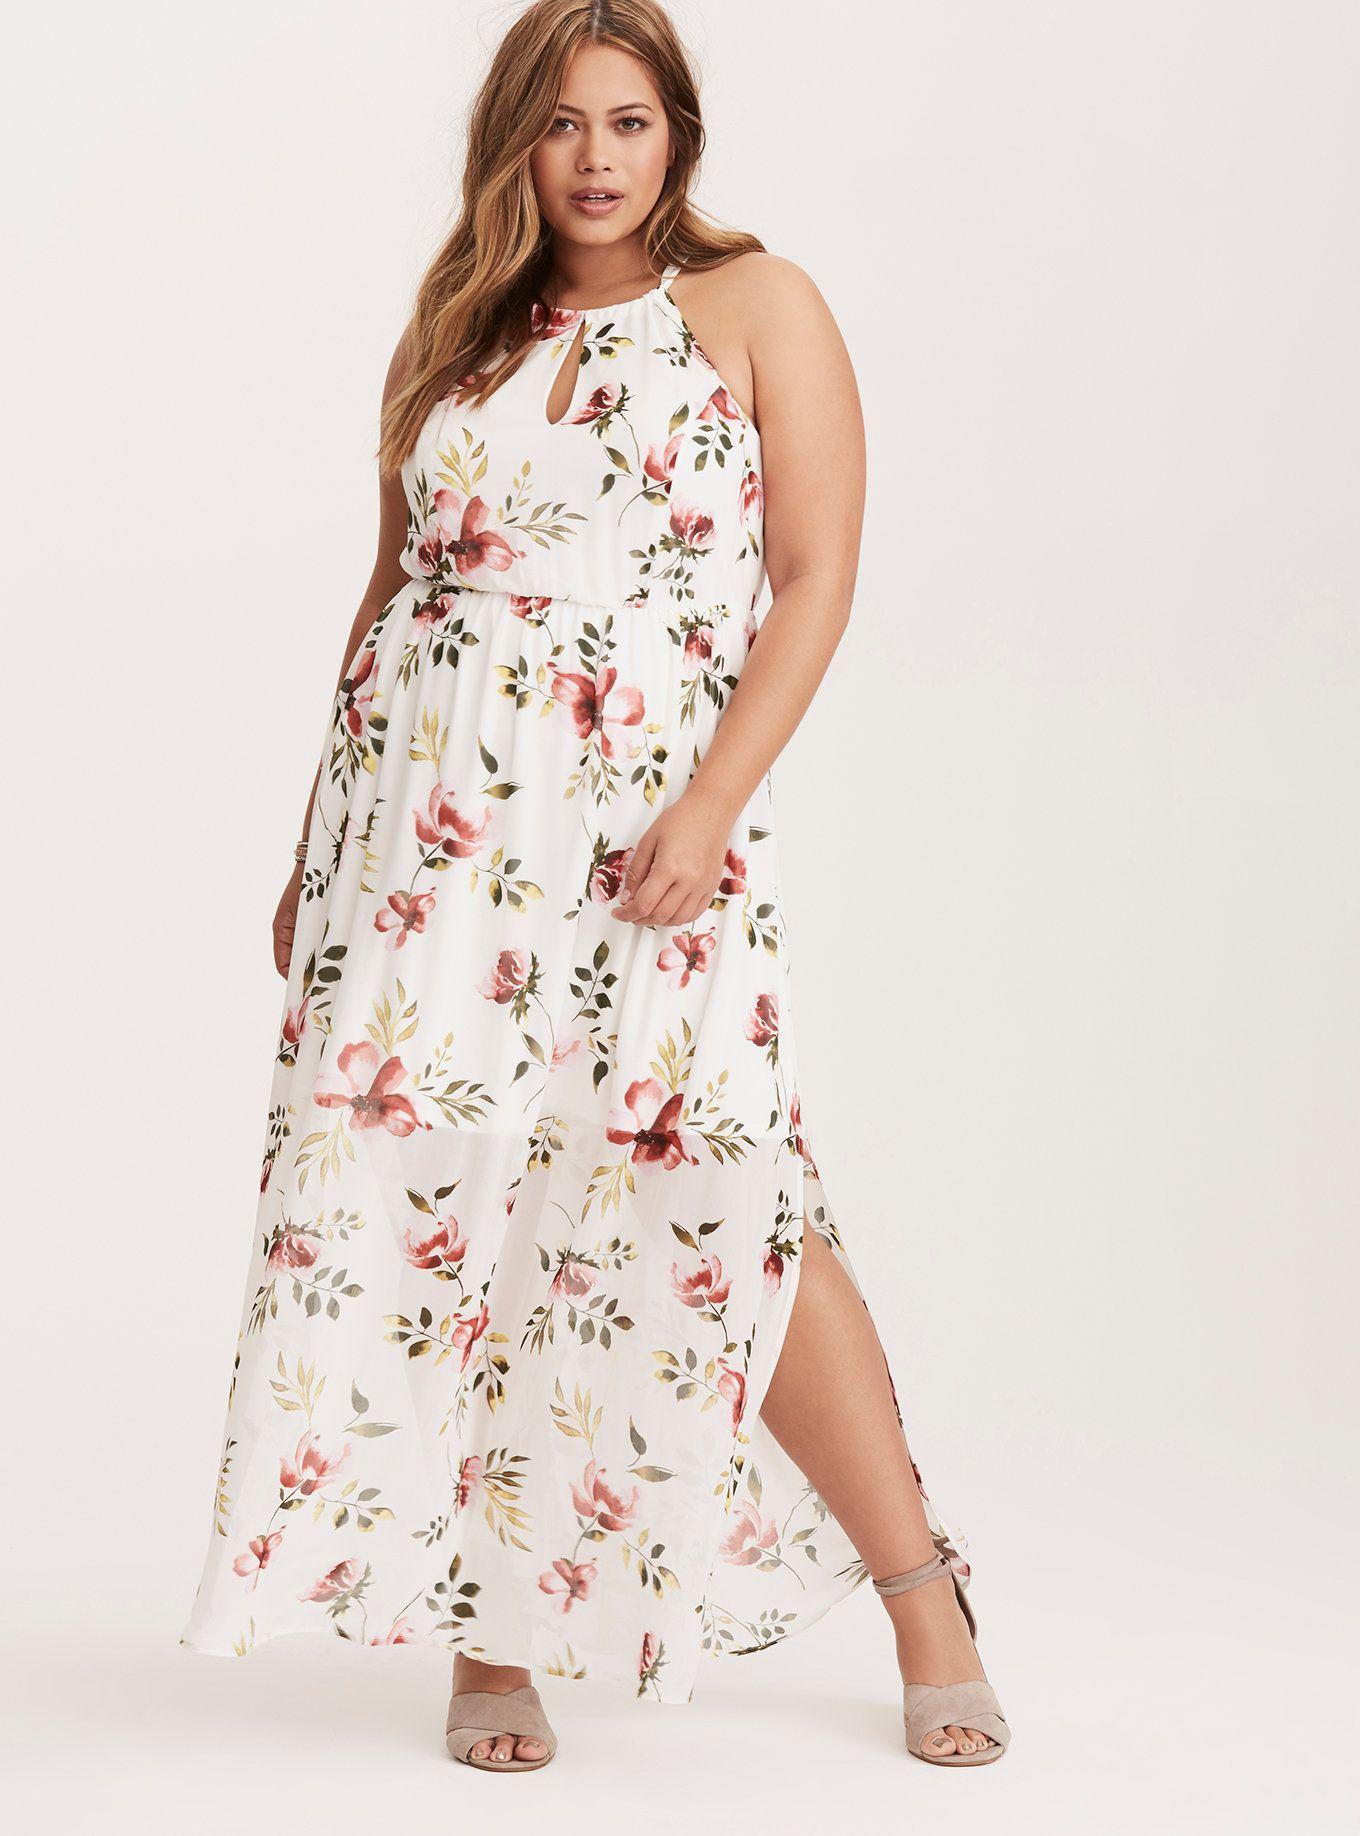 White Floral Keyhole Cutaway Maxi Dress Short Inseam Now Available Plus Size Maxi Dresses Lace Maxi Dress Maxi Dress [ 1836 x 1360 Pixel ]